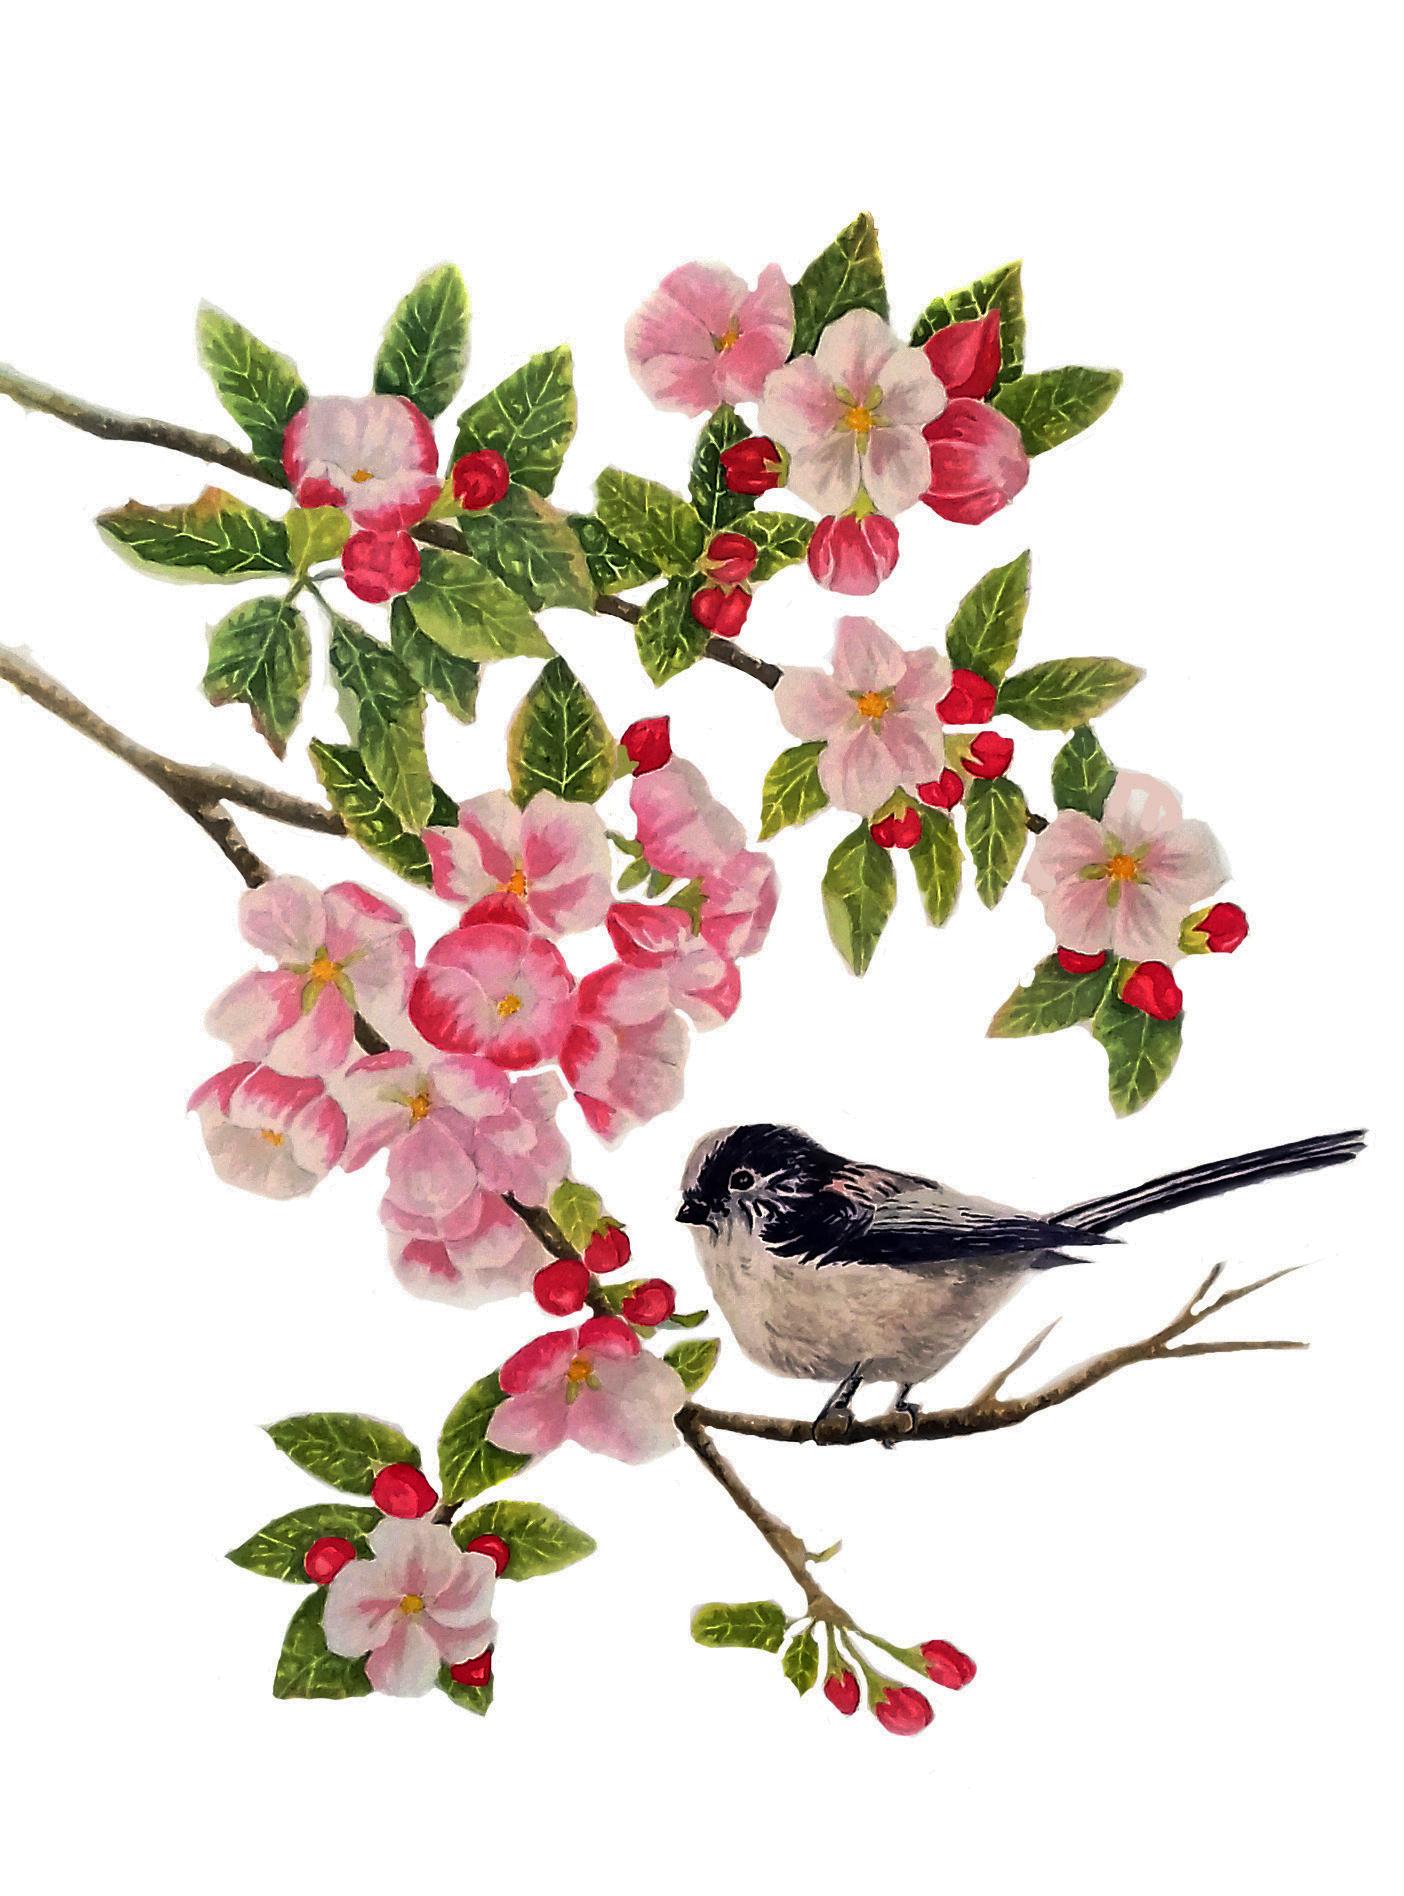 Amongst the Apple Blossom